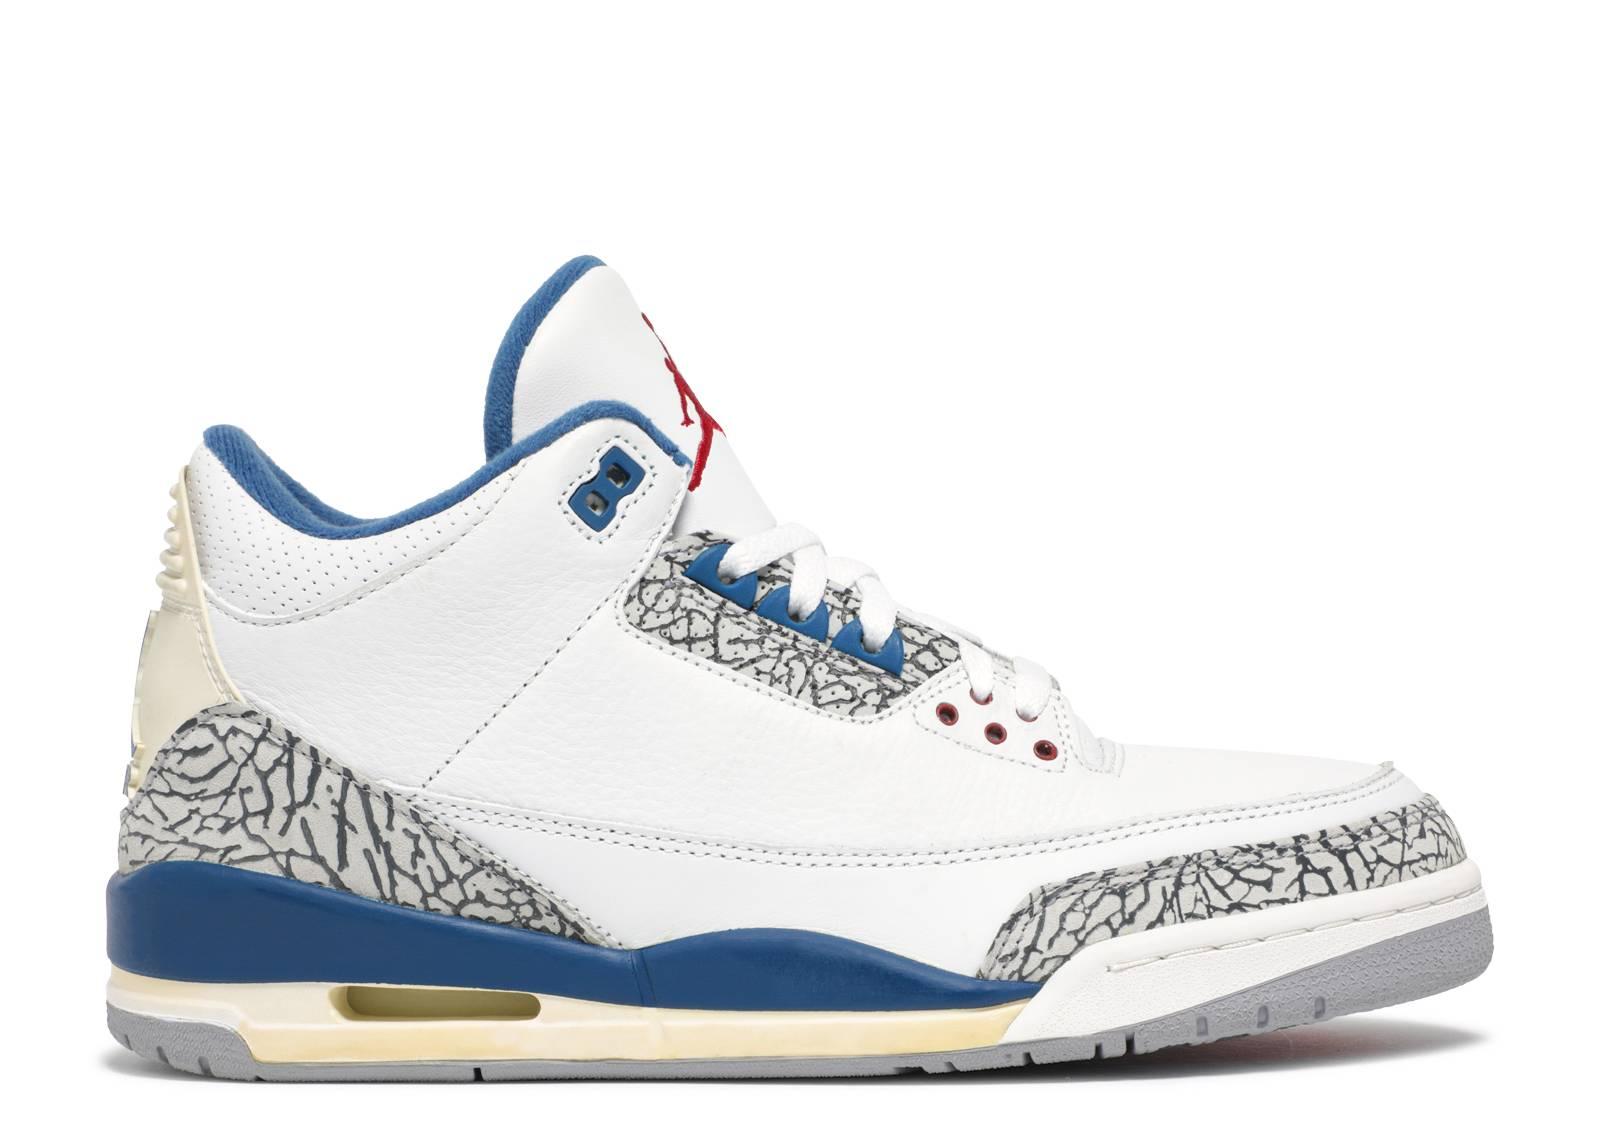 7e8a1900911 Air Jordan 3 Retro